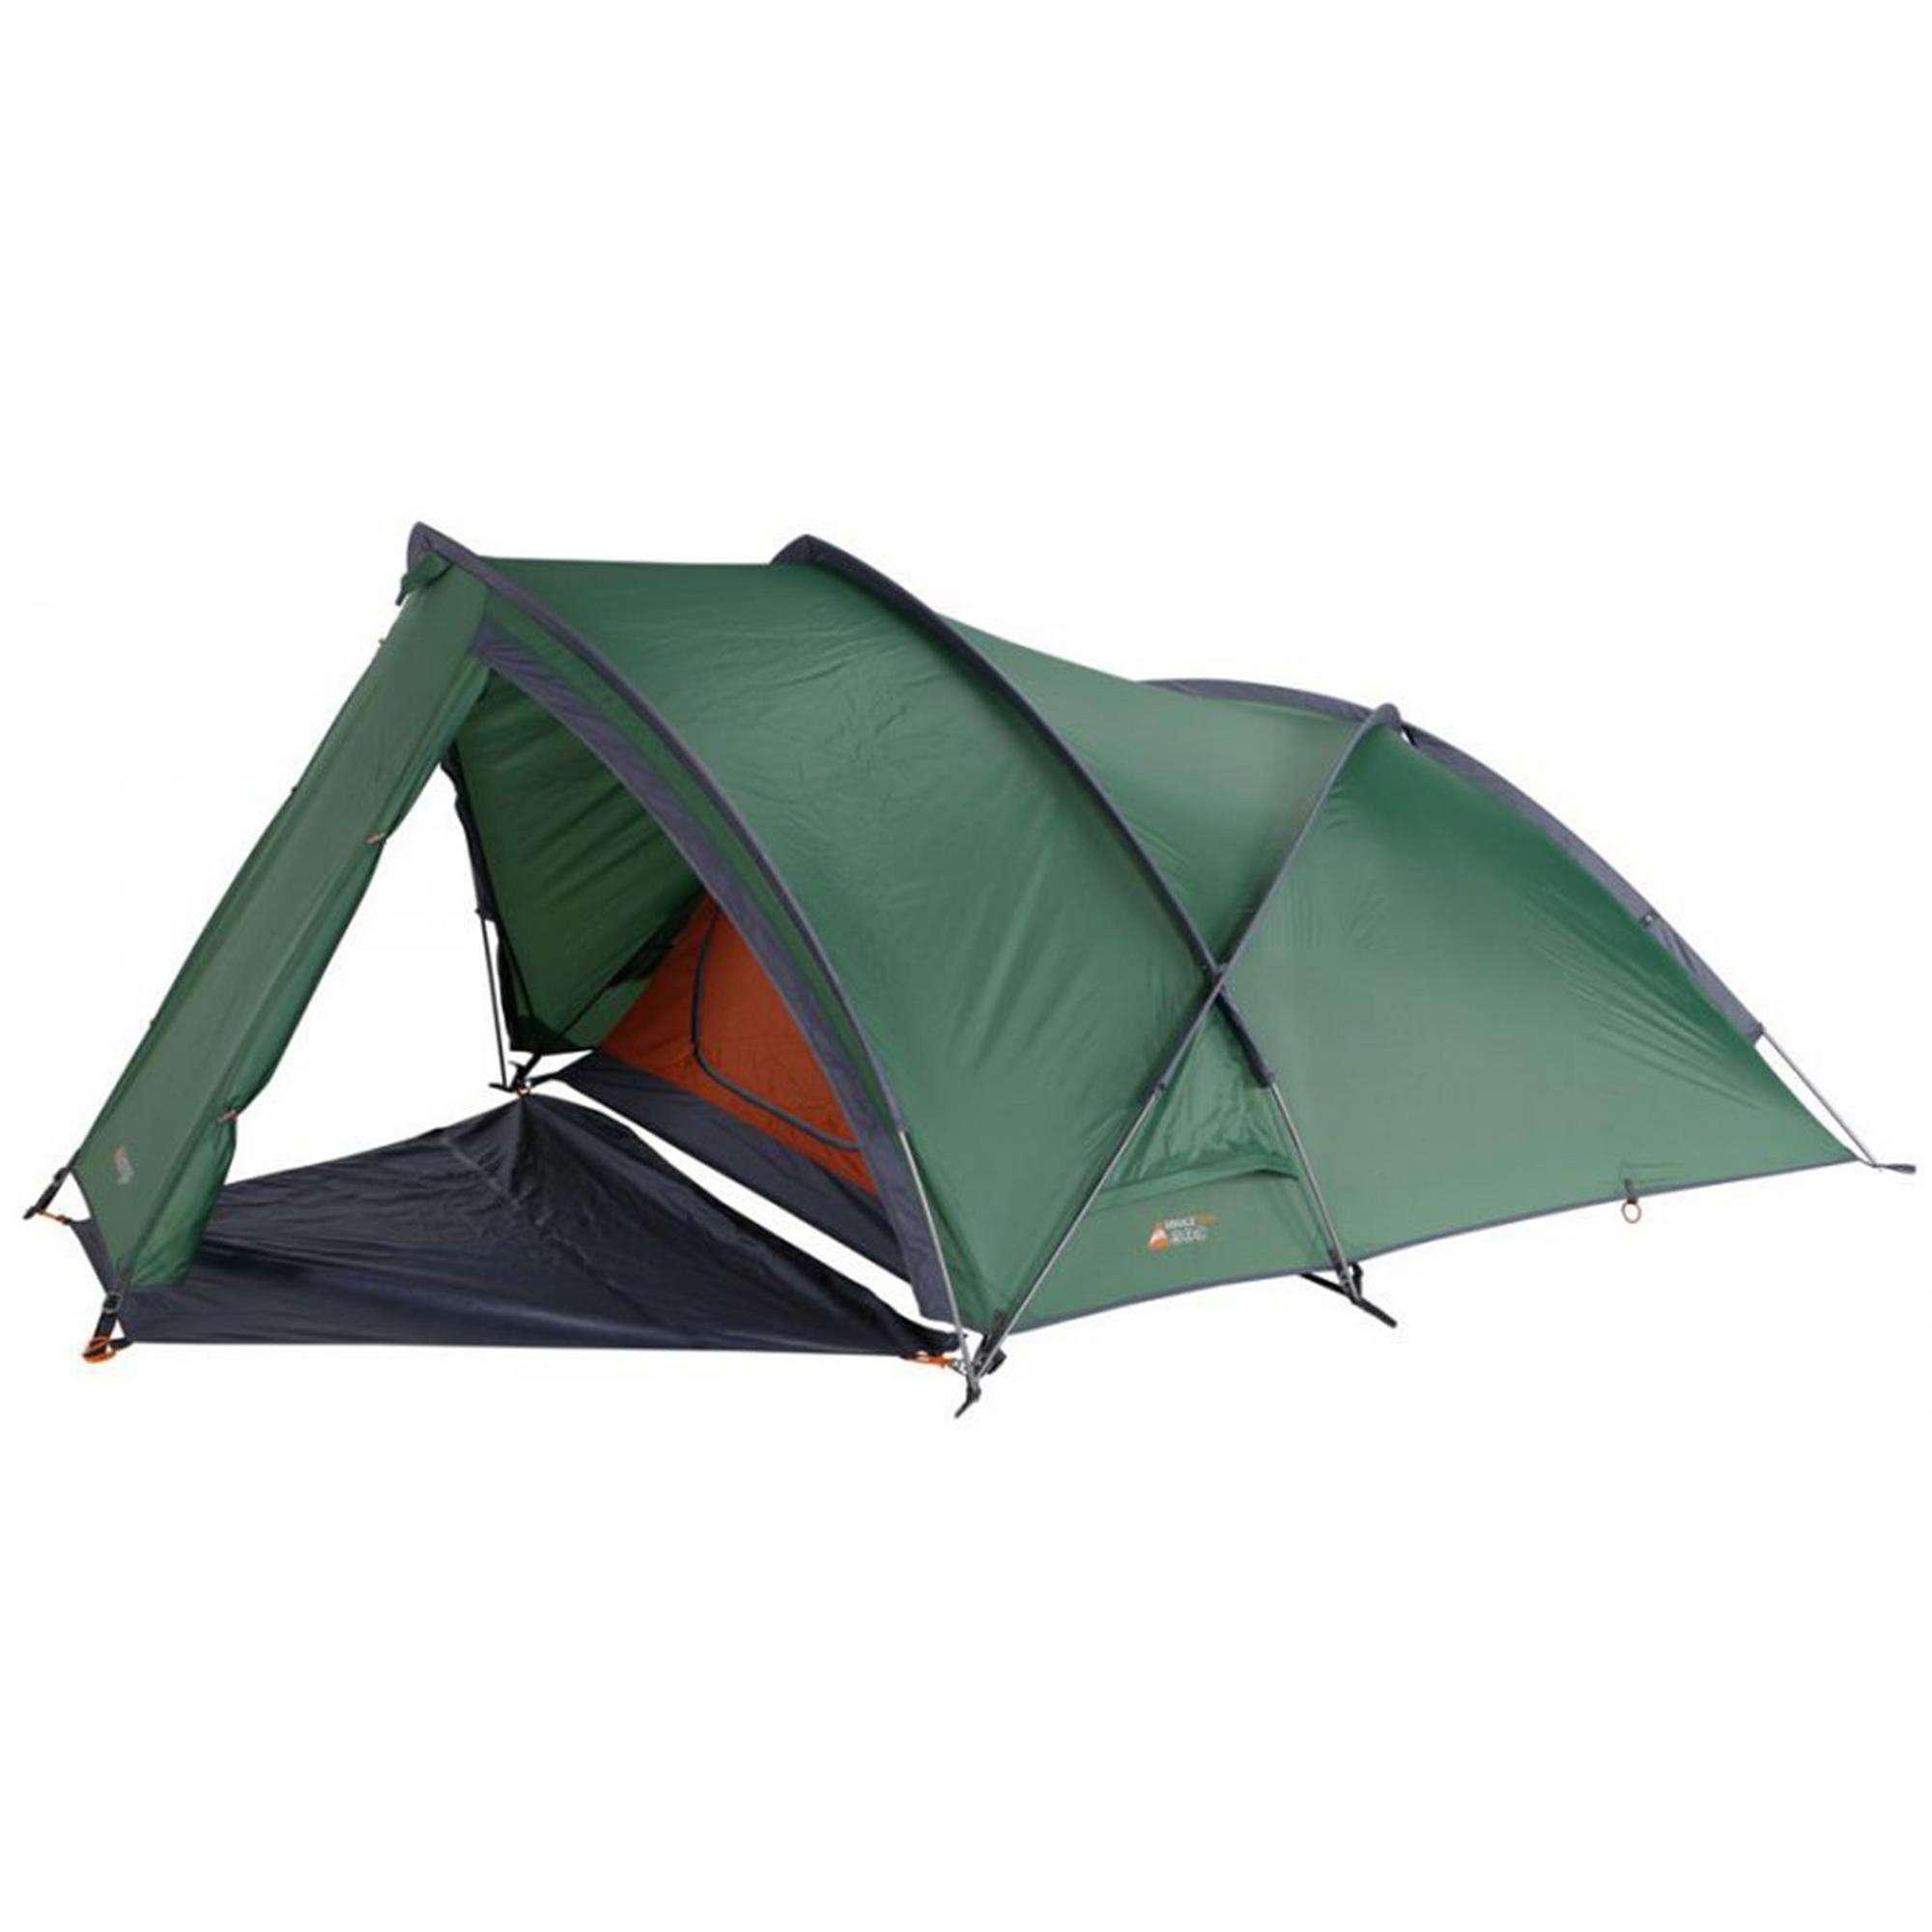 VANGO Mirage 300 Plus 3 Man Technical Tent